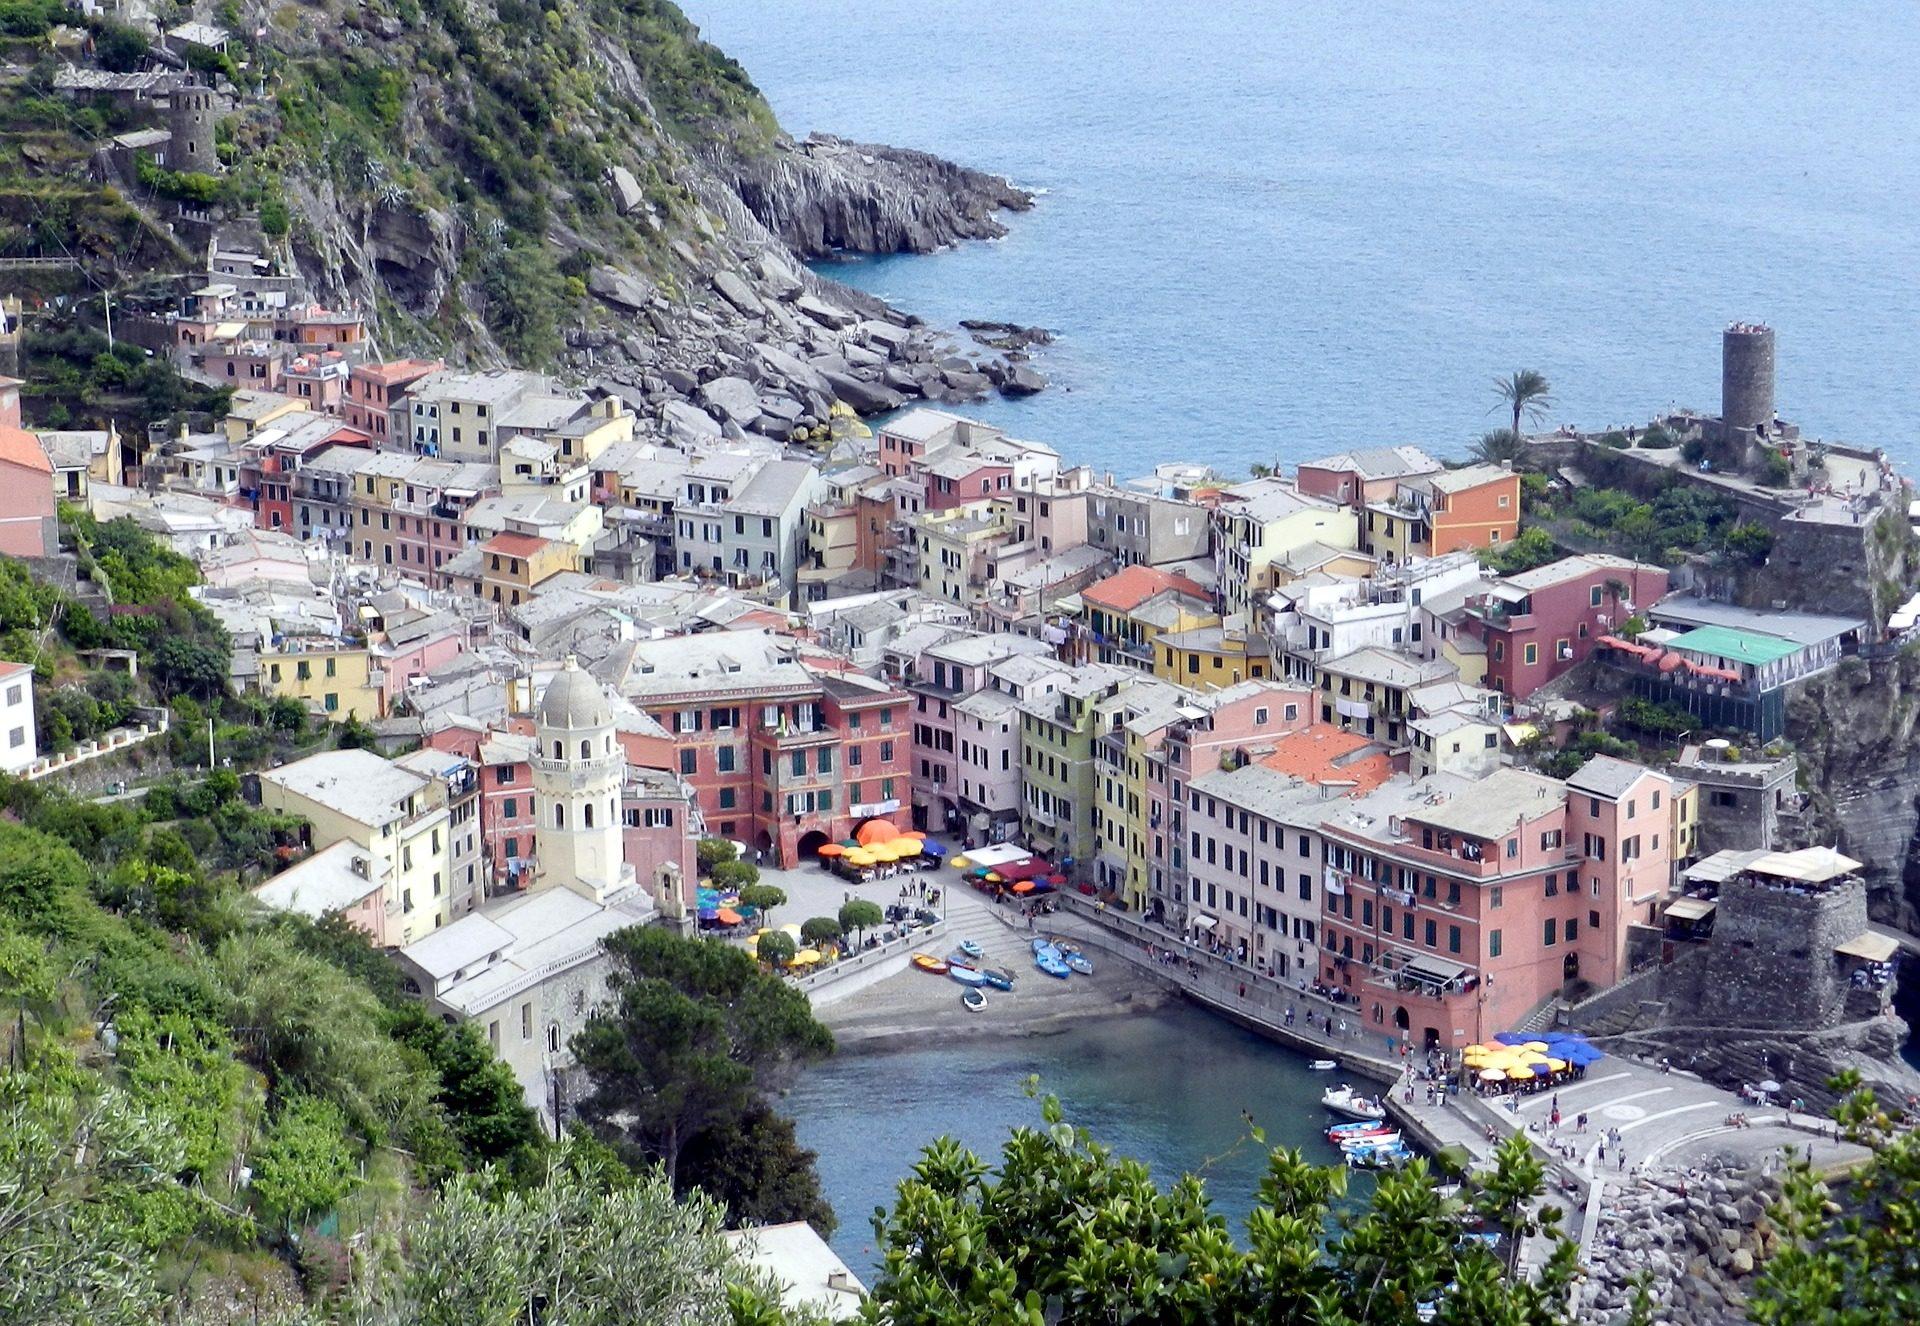 गांव, मकान, पोर्ट, सागर, पहाड़, Liguria, इटली - HD वॉलपेपर - प्रोफेसर-falken.com